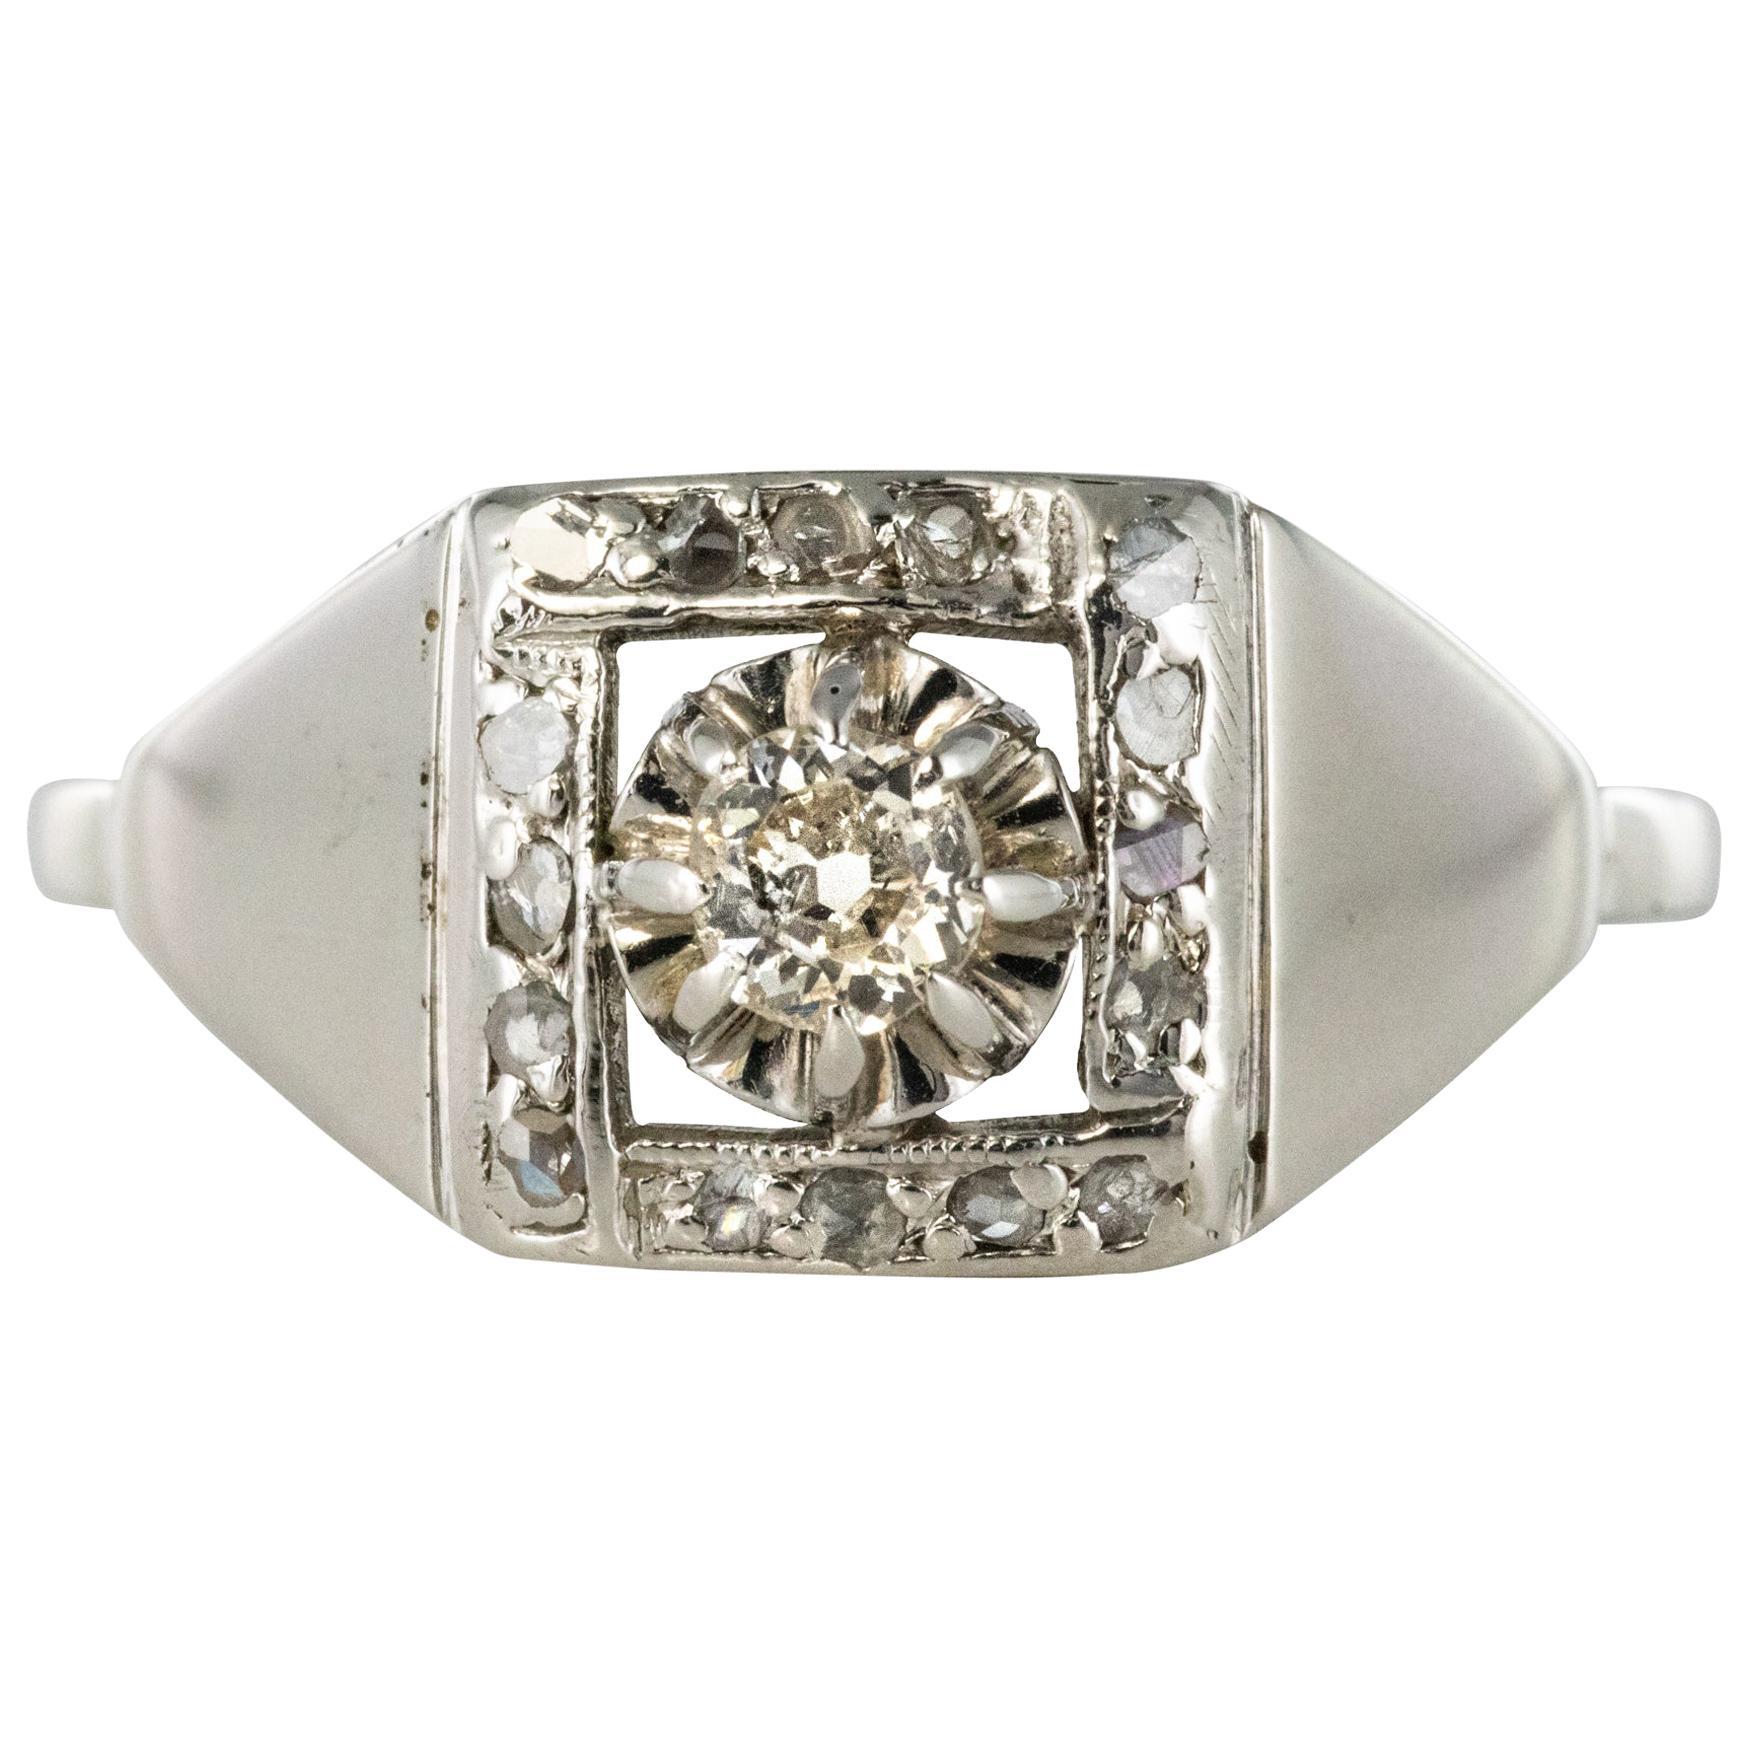 1930s White Gold Platinum Diamond Art Deco Ring